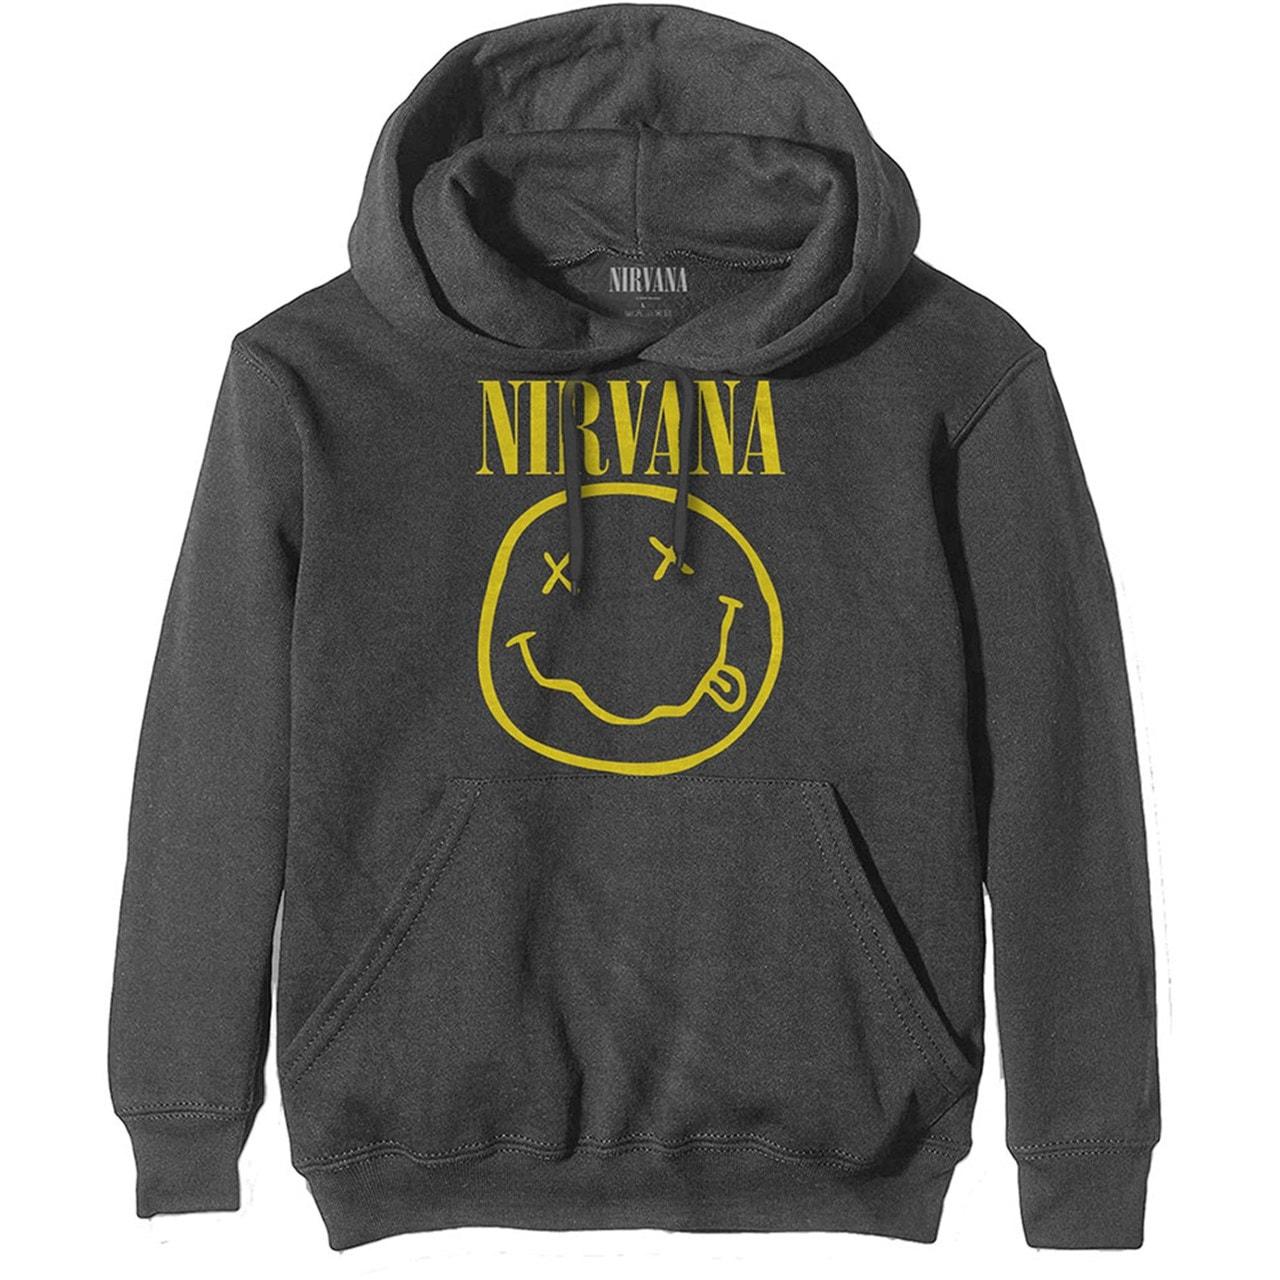 Nirvana Yellow Smiley Hoodie (Large) - 1